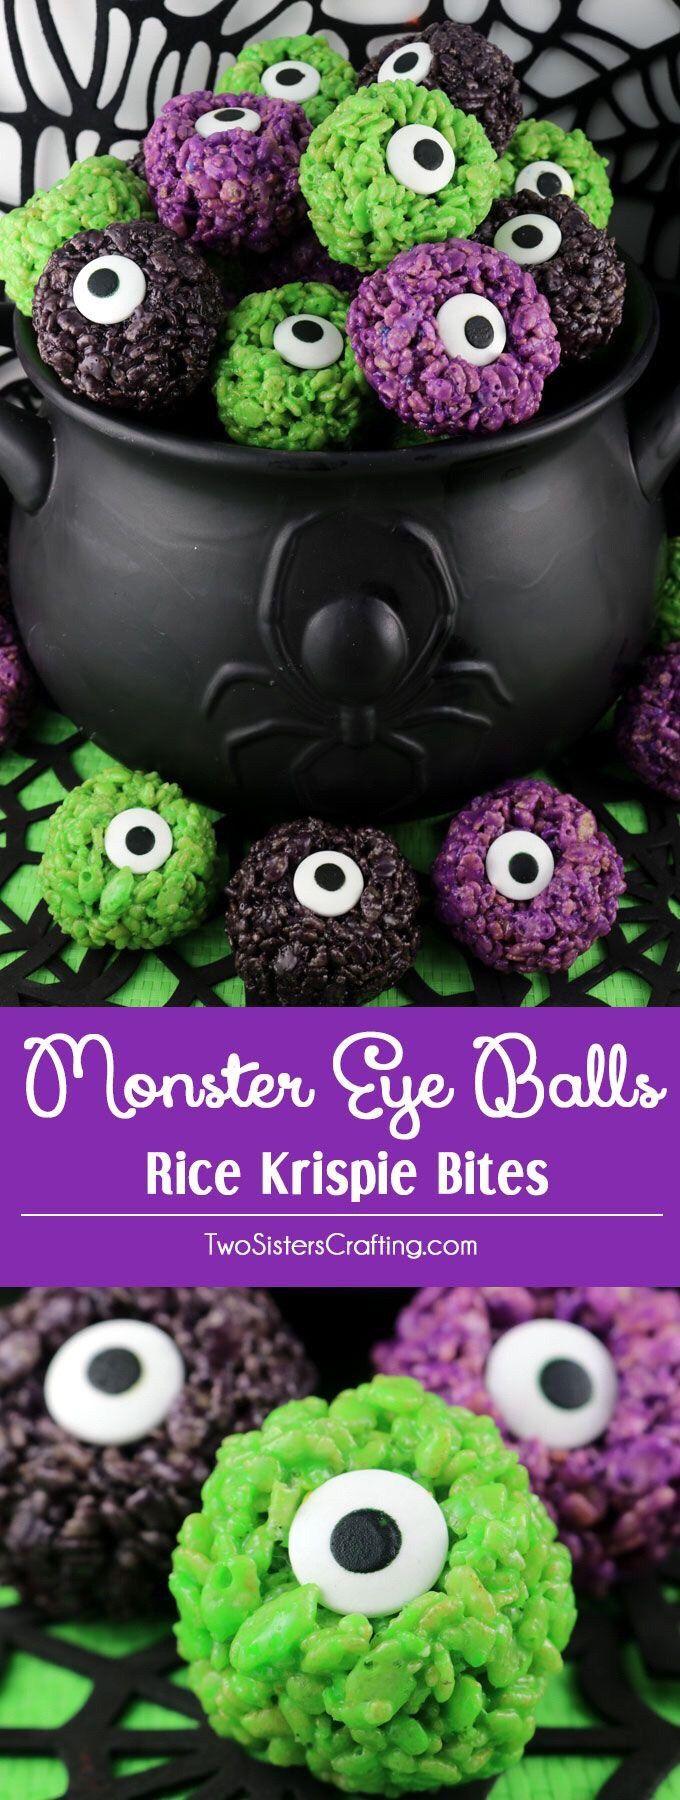 Monster Eye Balls Rice Krispie Bites #halloweentreatsforschool